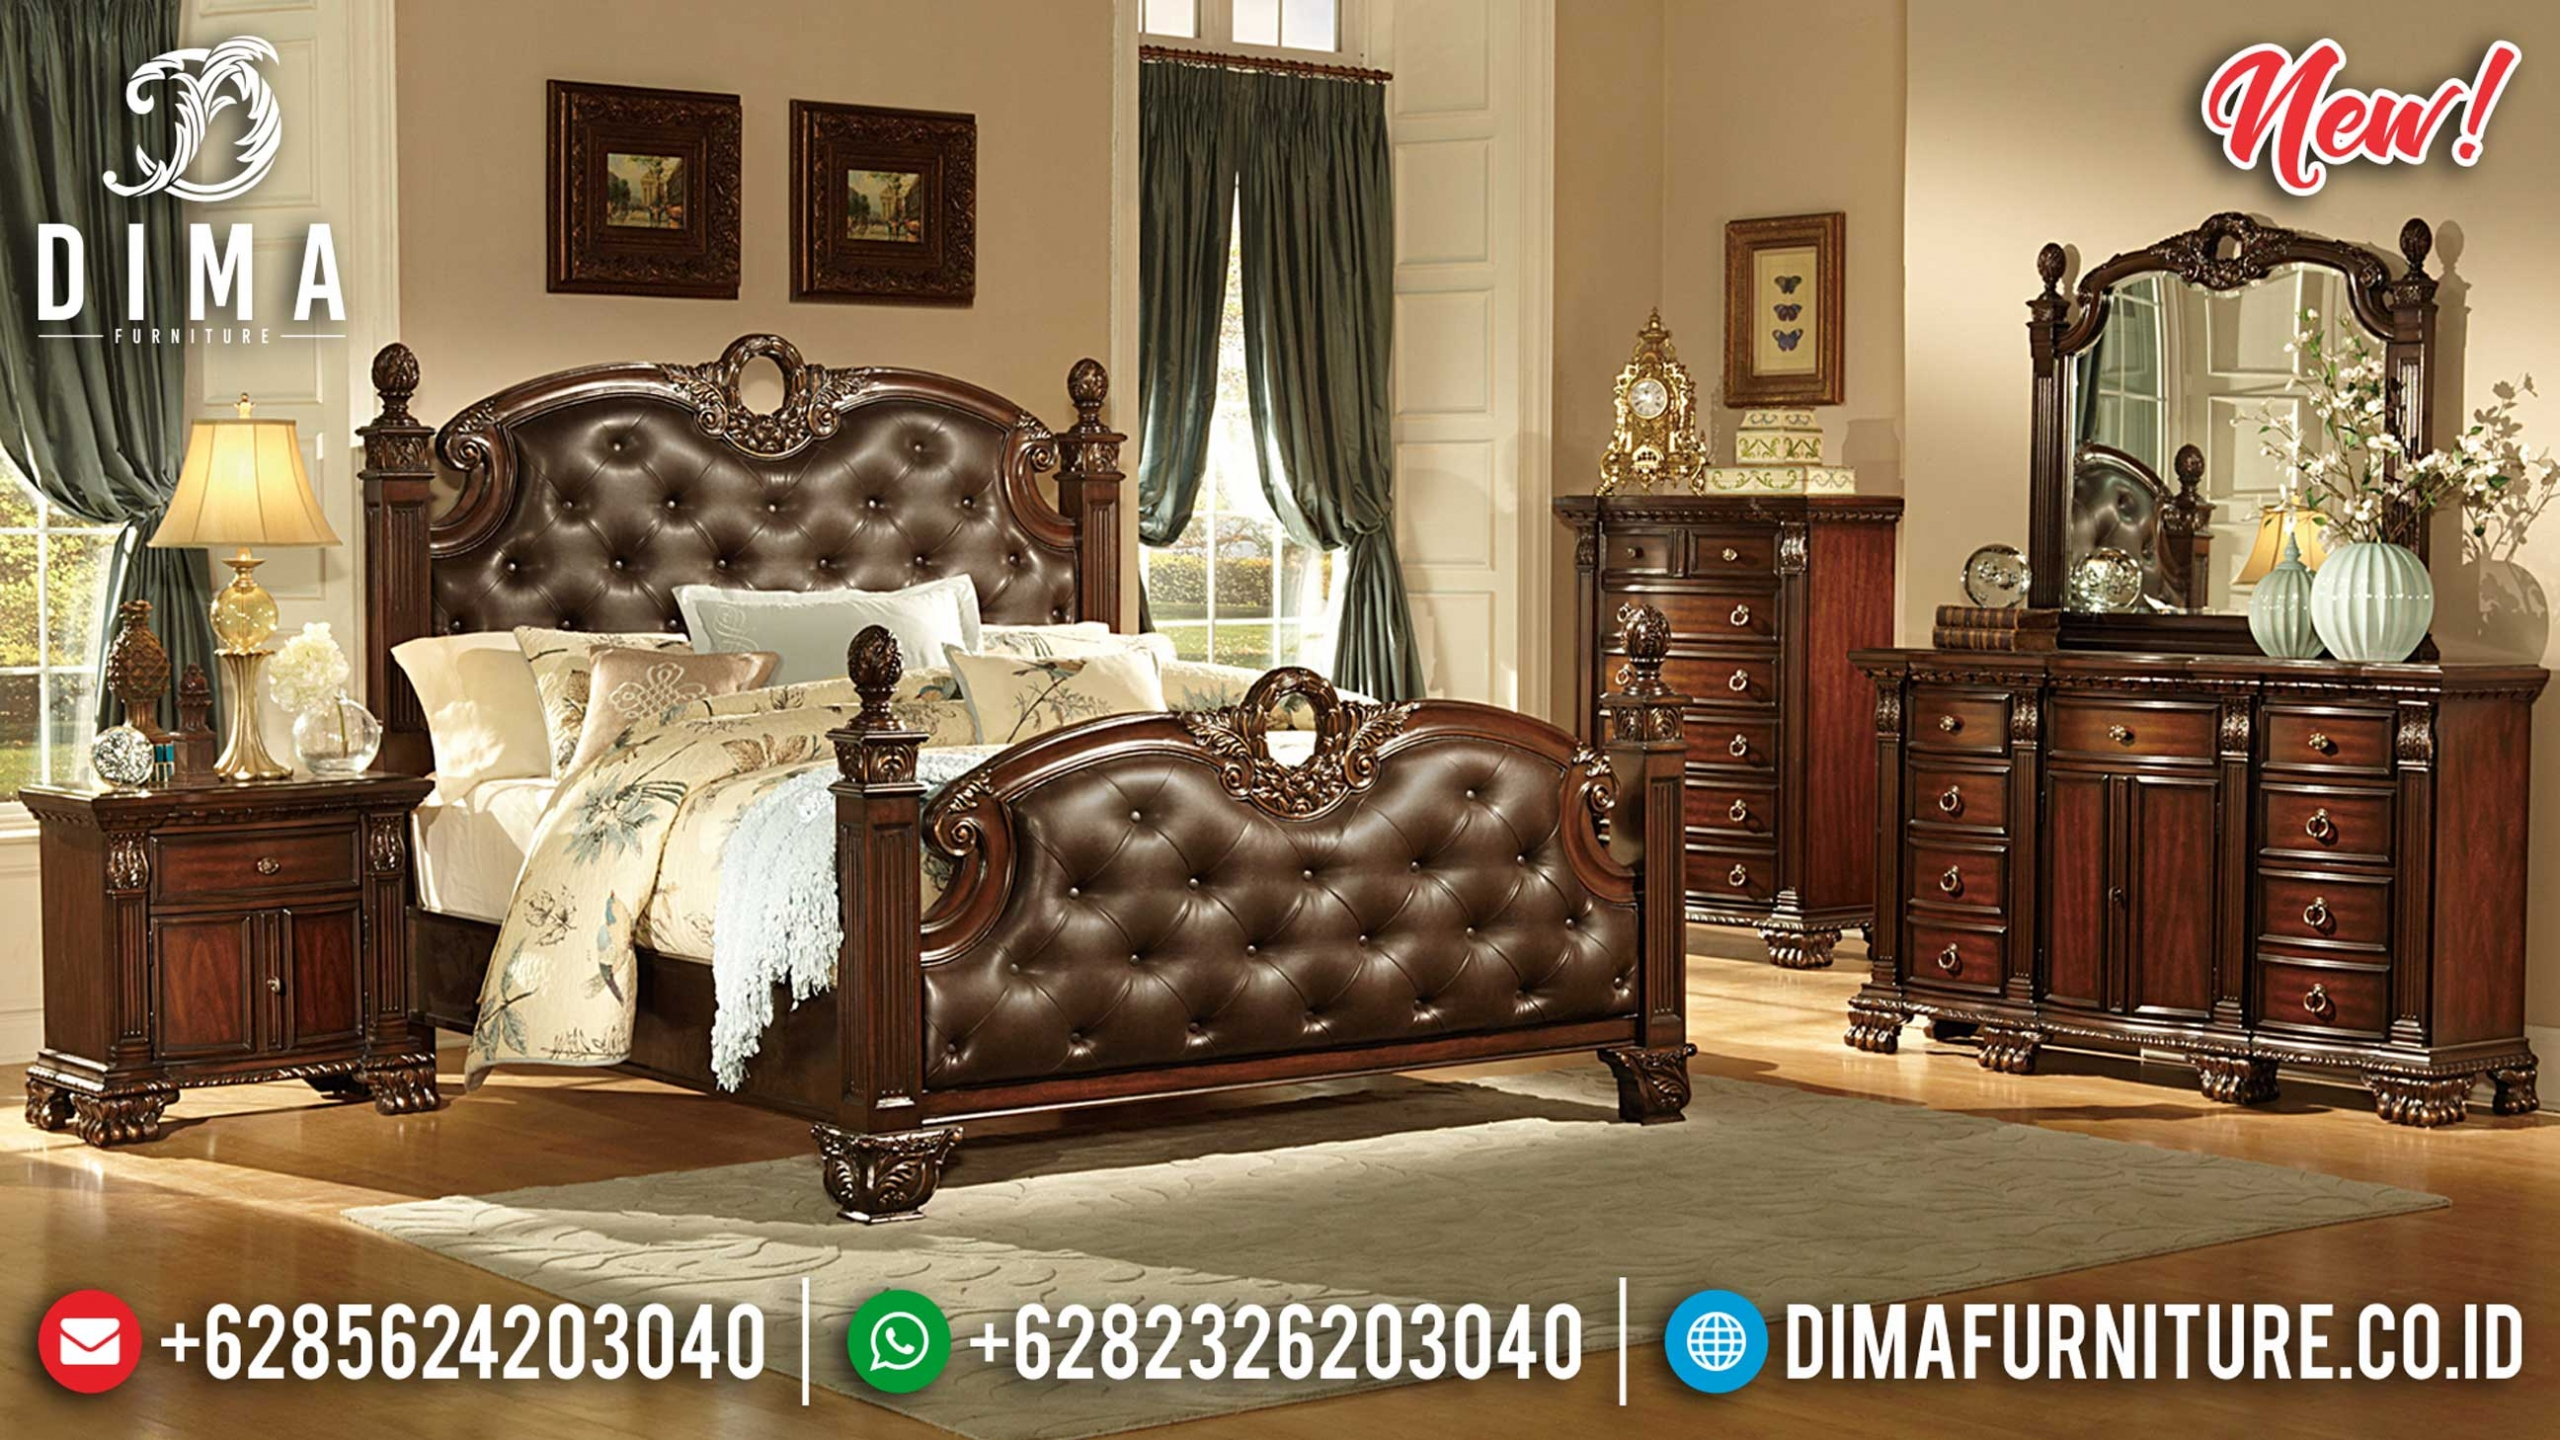 Kamar Set Klasik Natural Jati Luxury Minimalis Mebel Jepara Terbaru BT-0919